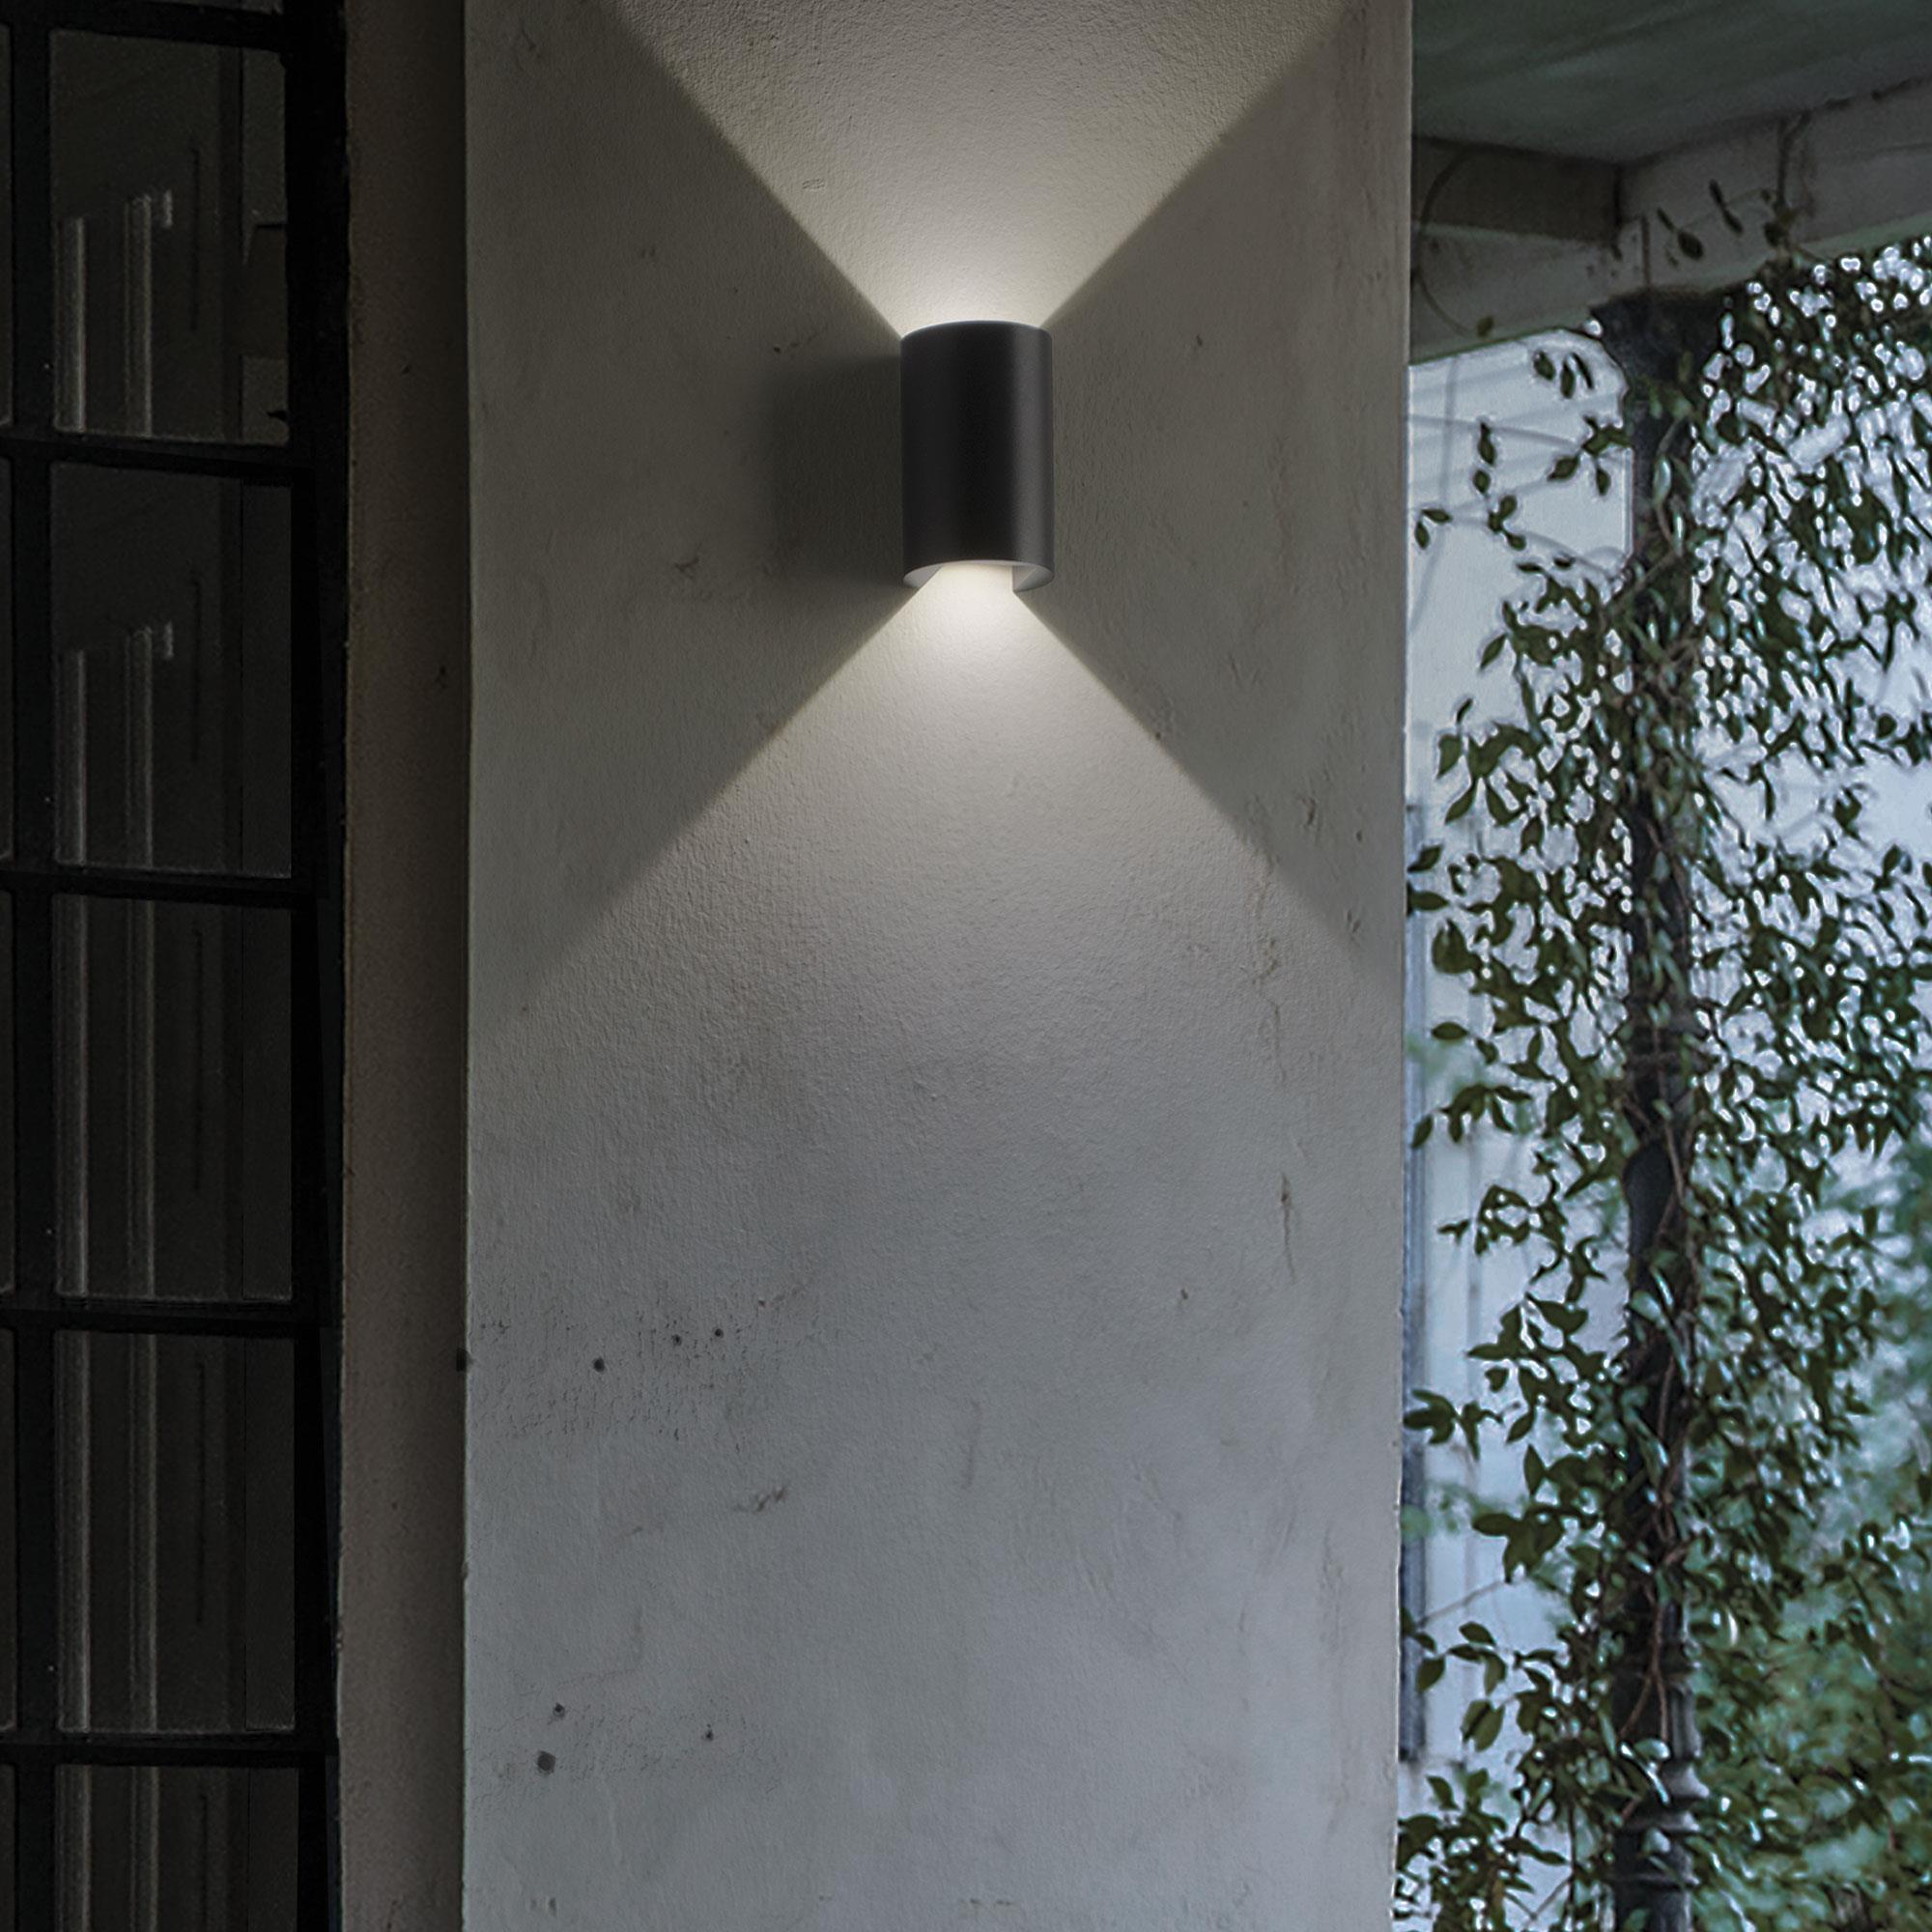 Ideal Lux 137391 APOLLO AP2 NERO kültéri LED falilámpa